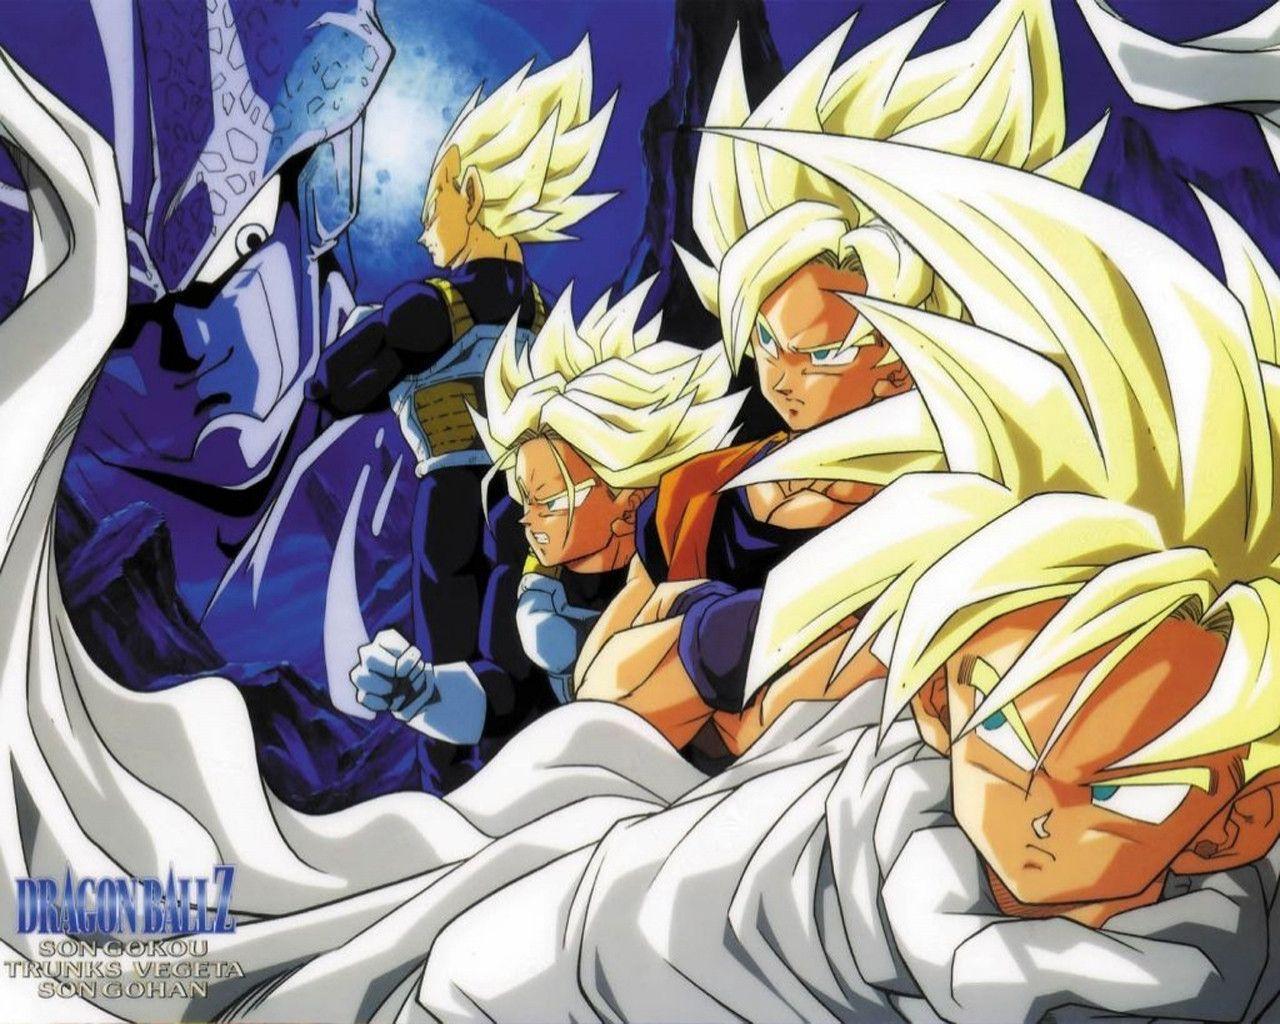 Dragon Ball Z Trunks Wallpaper Hd Wengerluggagesave